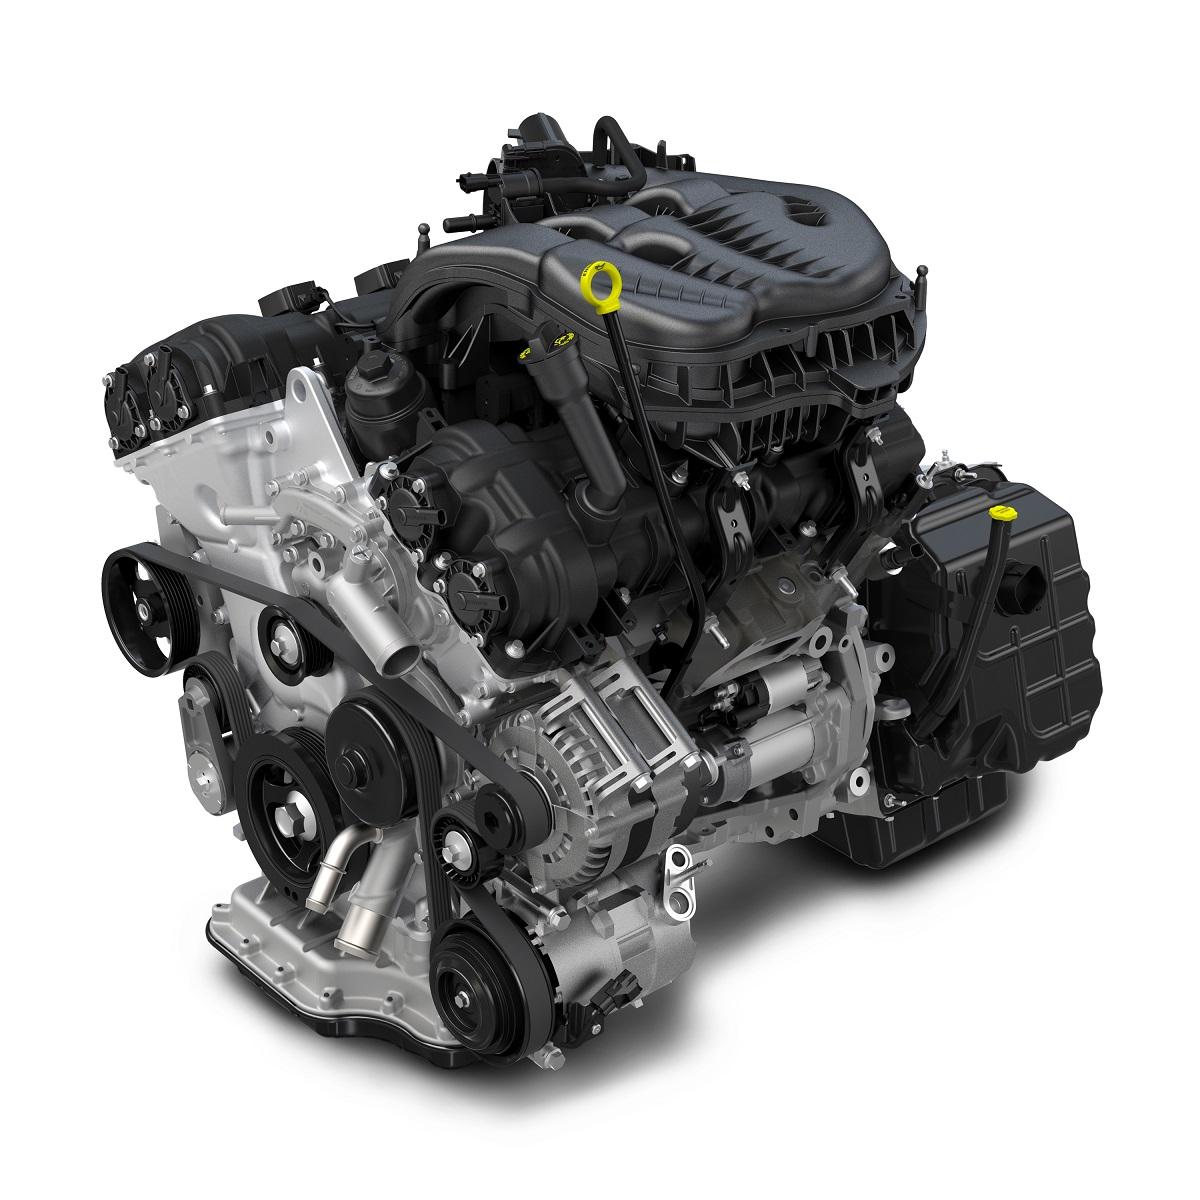 chrysler 3 8 serpentine belt diagram hayes brake controller wiring dodge grand caravan 6 engine liter